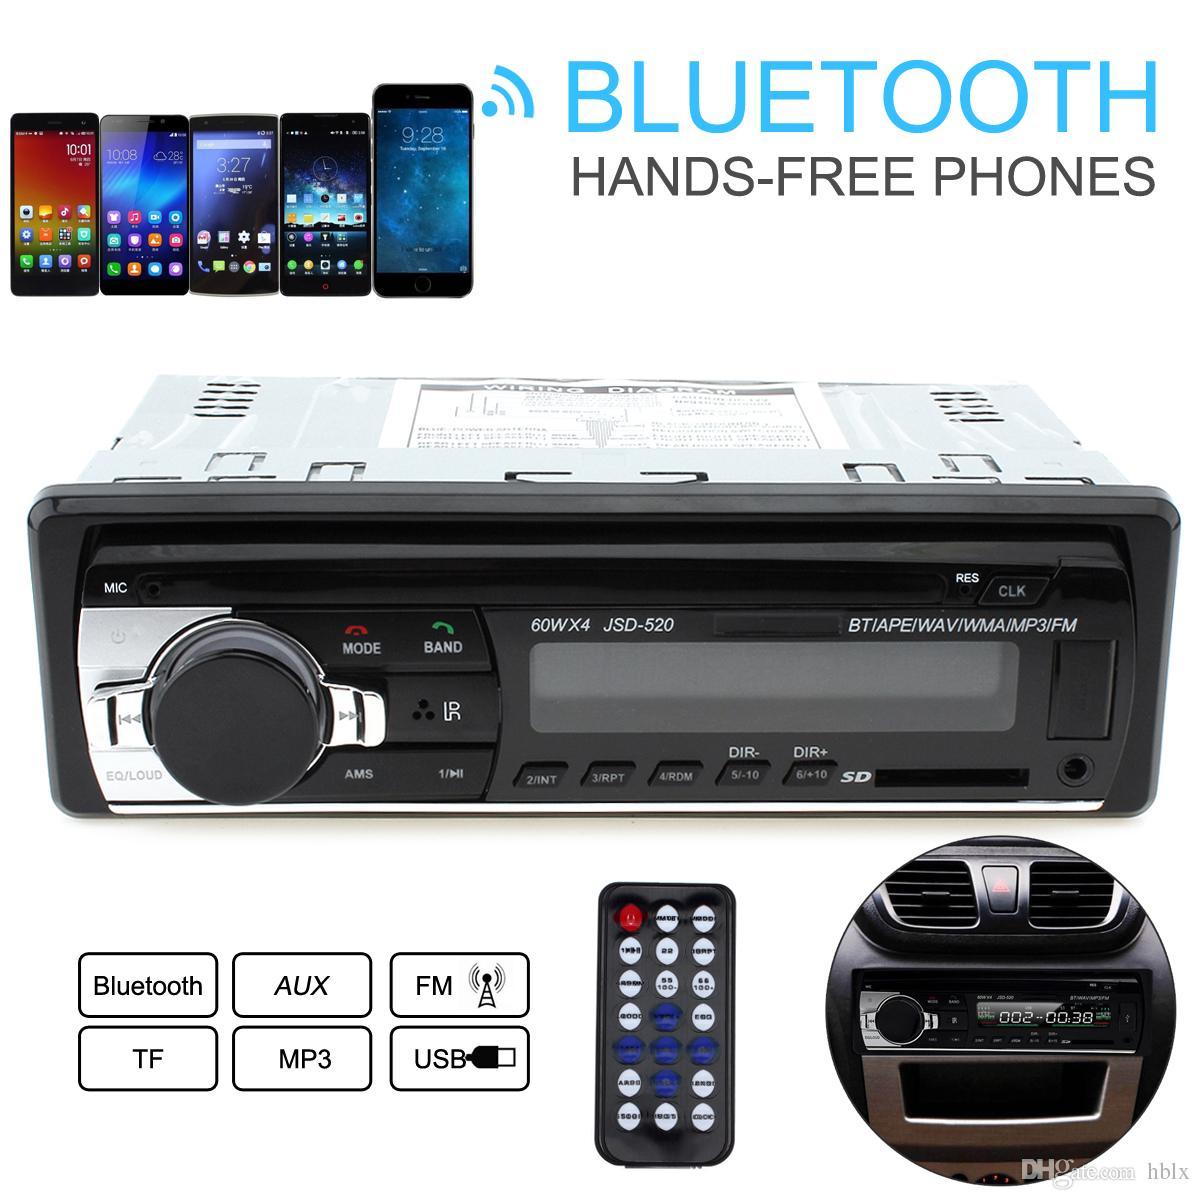 Jsd 520 12v car radio bluetooth remote control mp3 audio player support fm aux input receiver sd usb mp3 mmc wma cau_01i best car audio best car audio